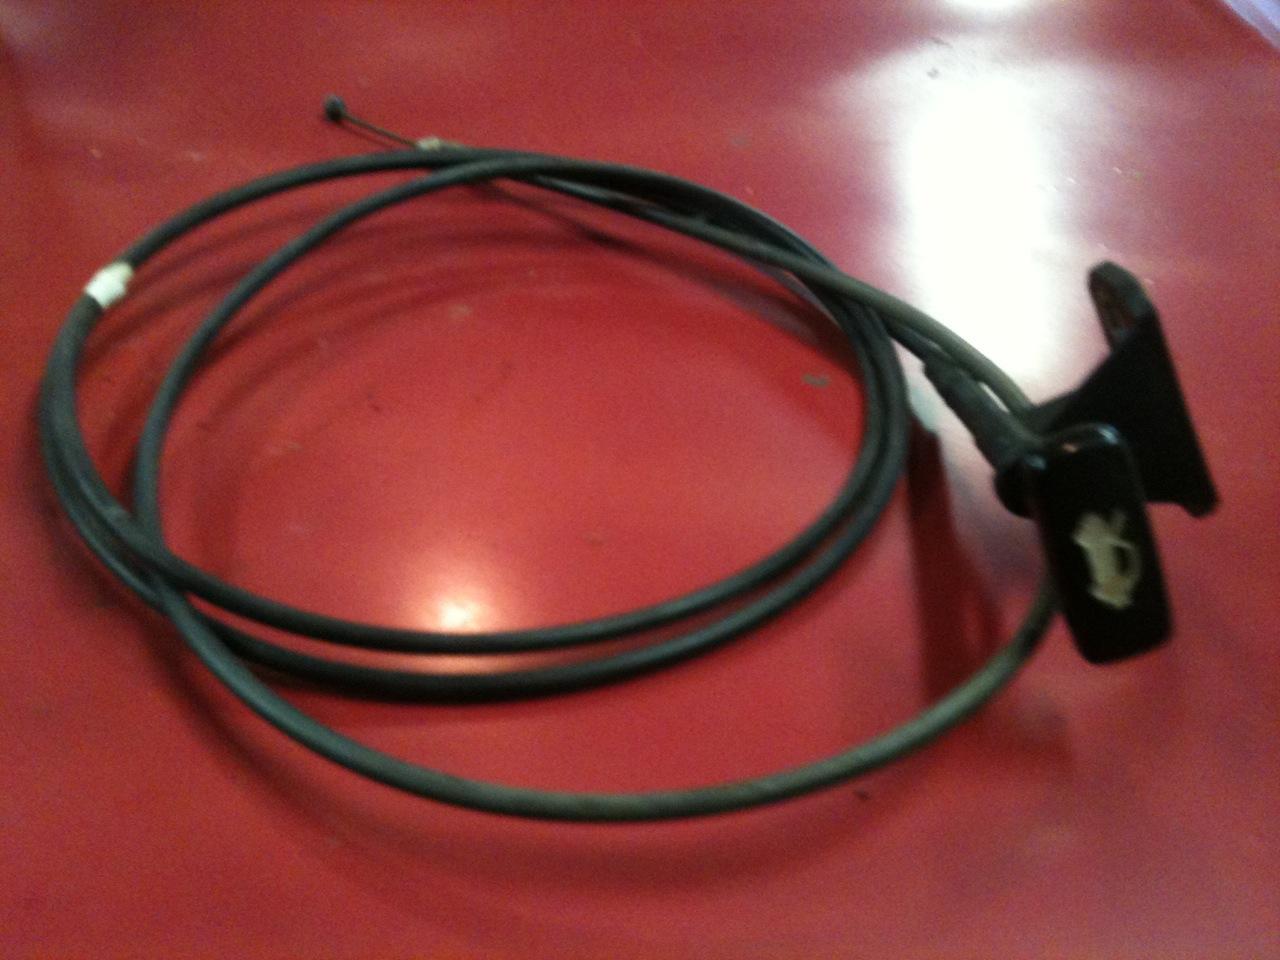 Landcruiser Parts for Sale: FJ60 Hood latch, $8